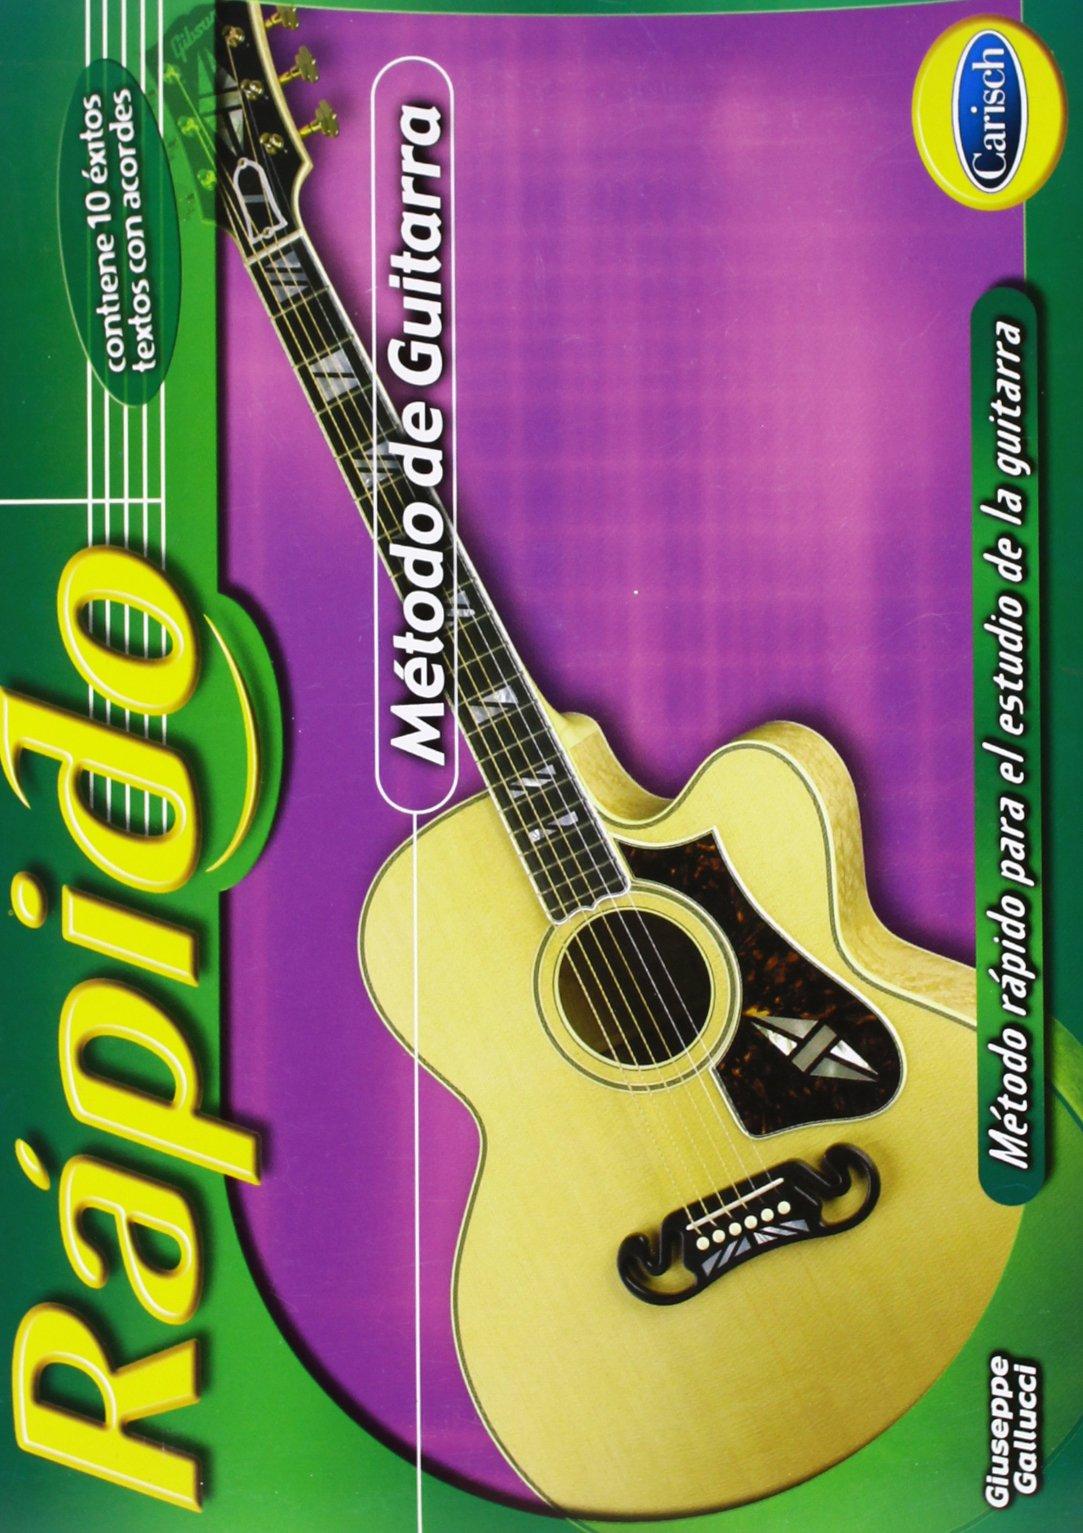 Rapido - Método de Guitarra: Amazon.es: Gallucci, Giuseppe, Guitar ...